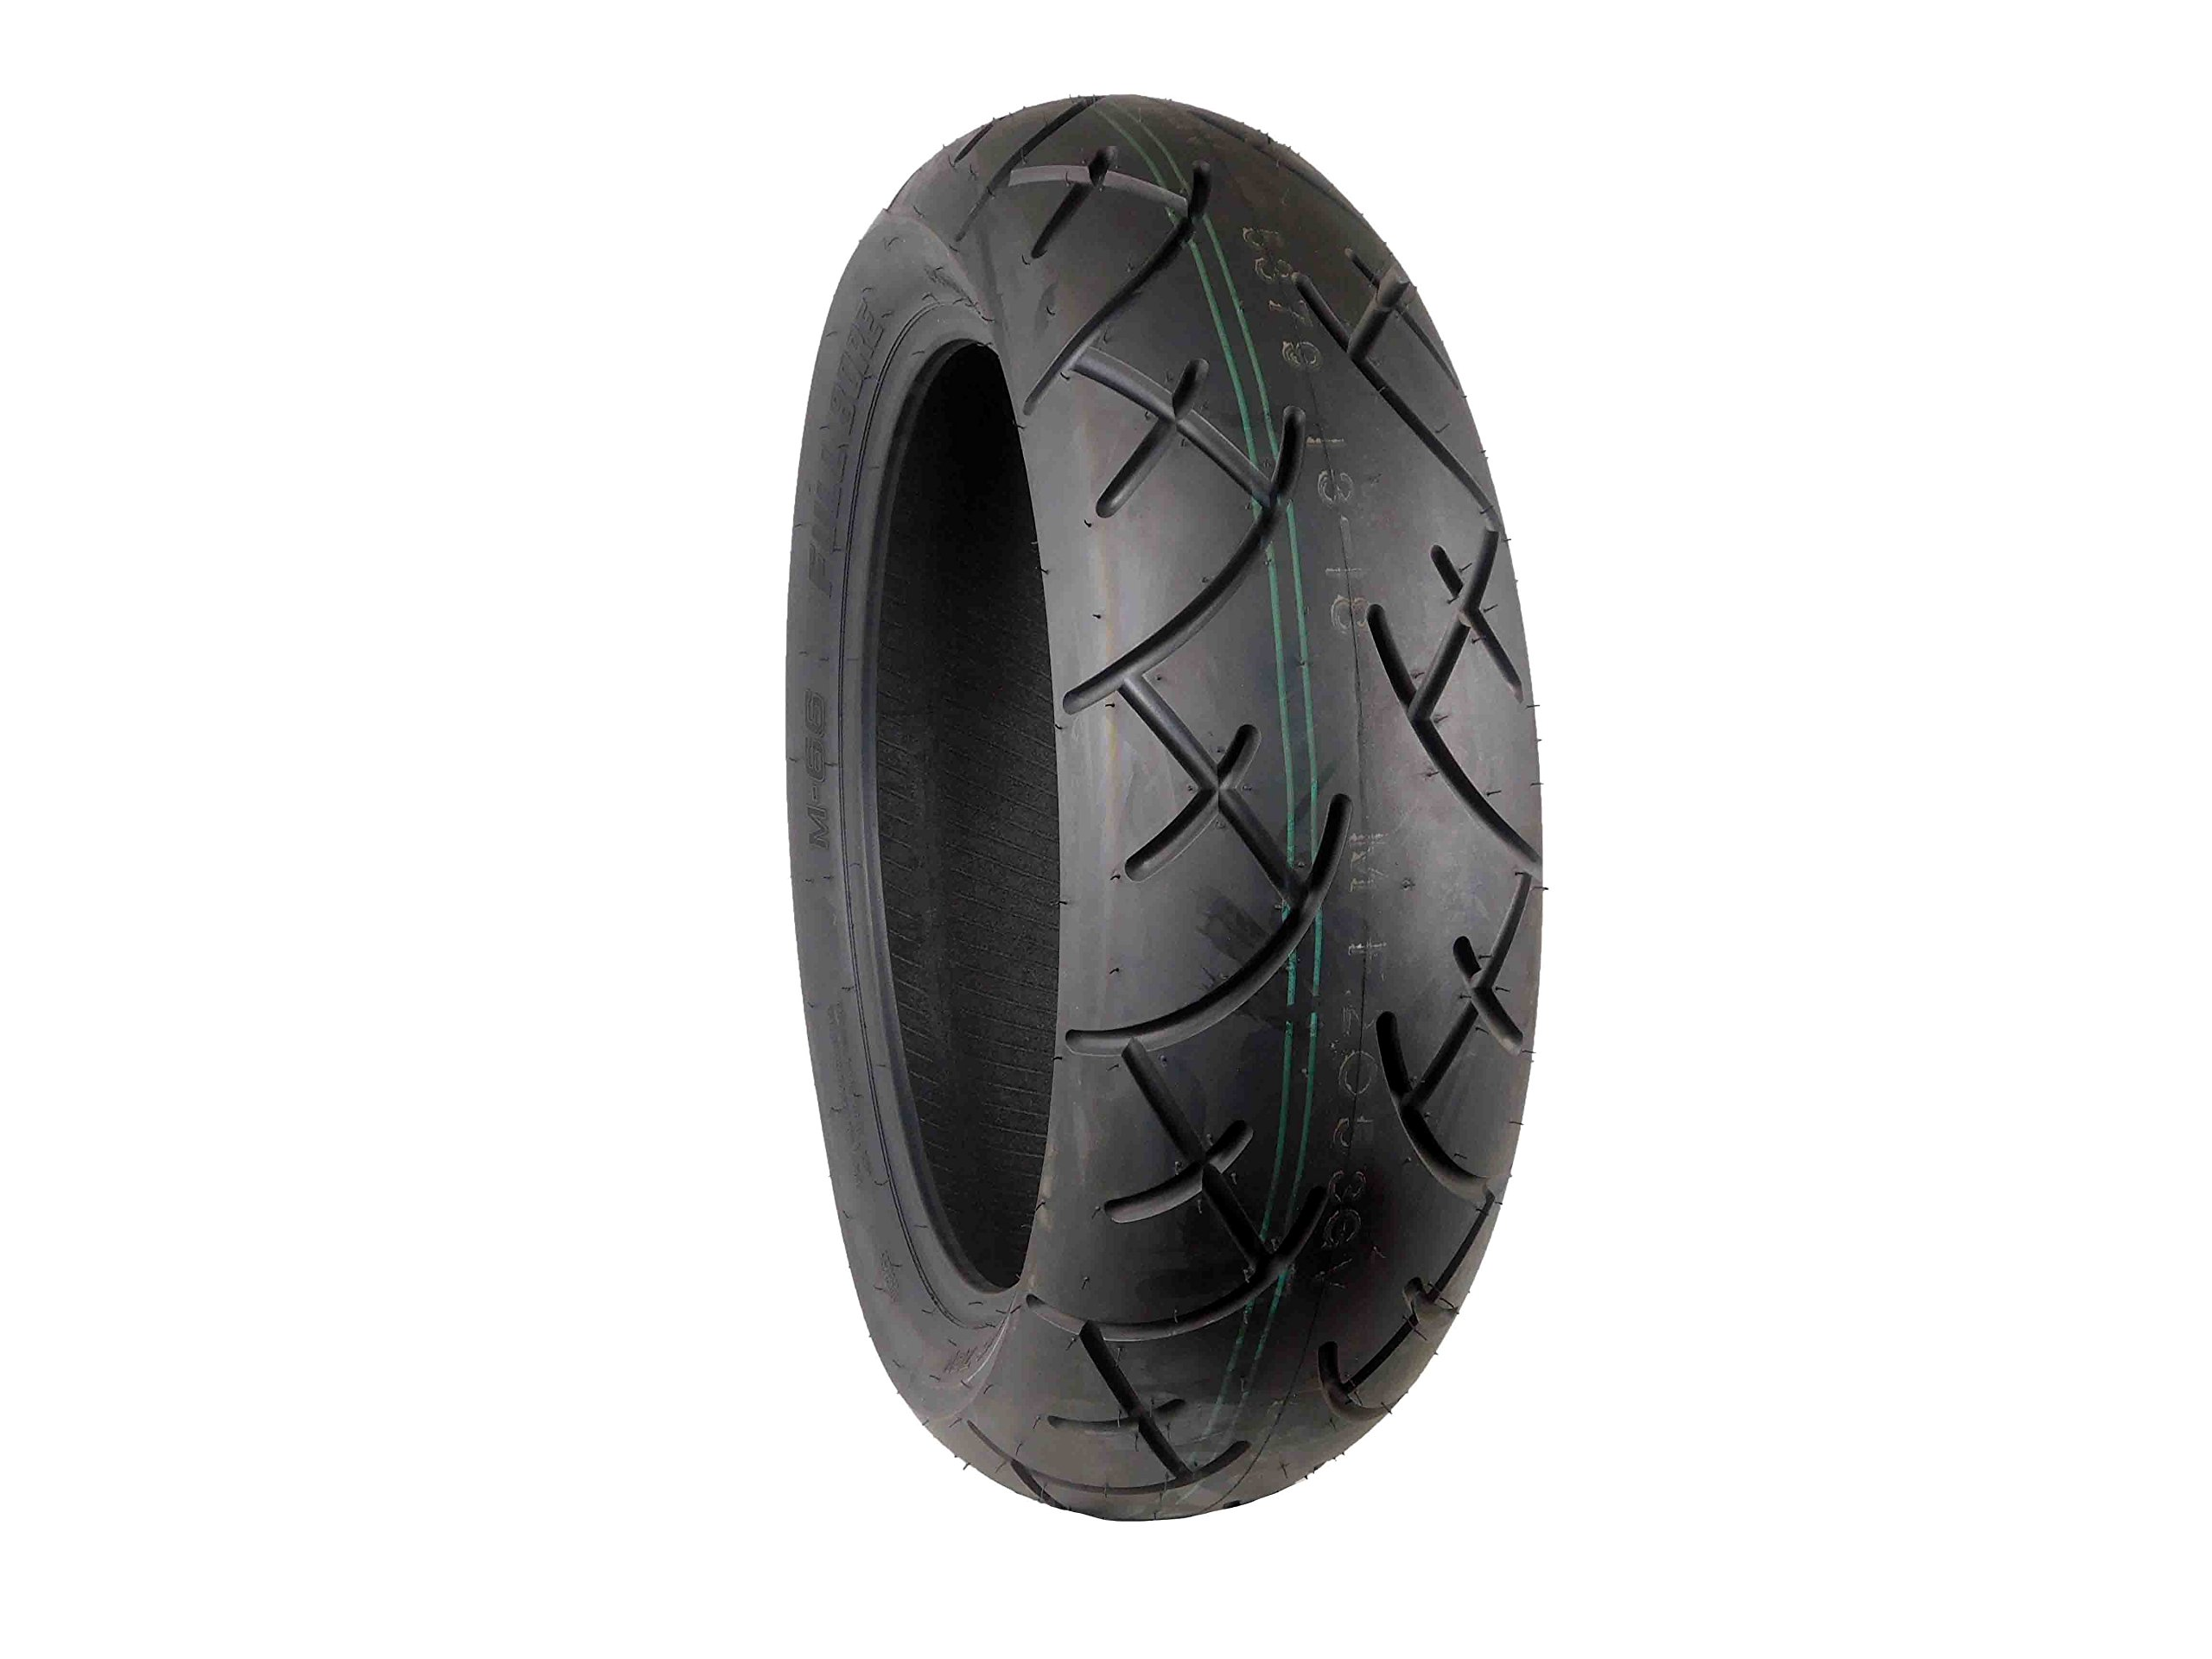 Full Bore M-66 Tour King Cruiser Motorcycle Tire (200/55R17)